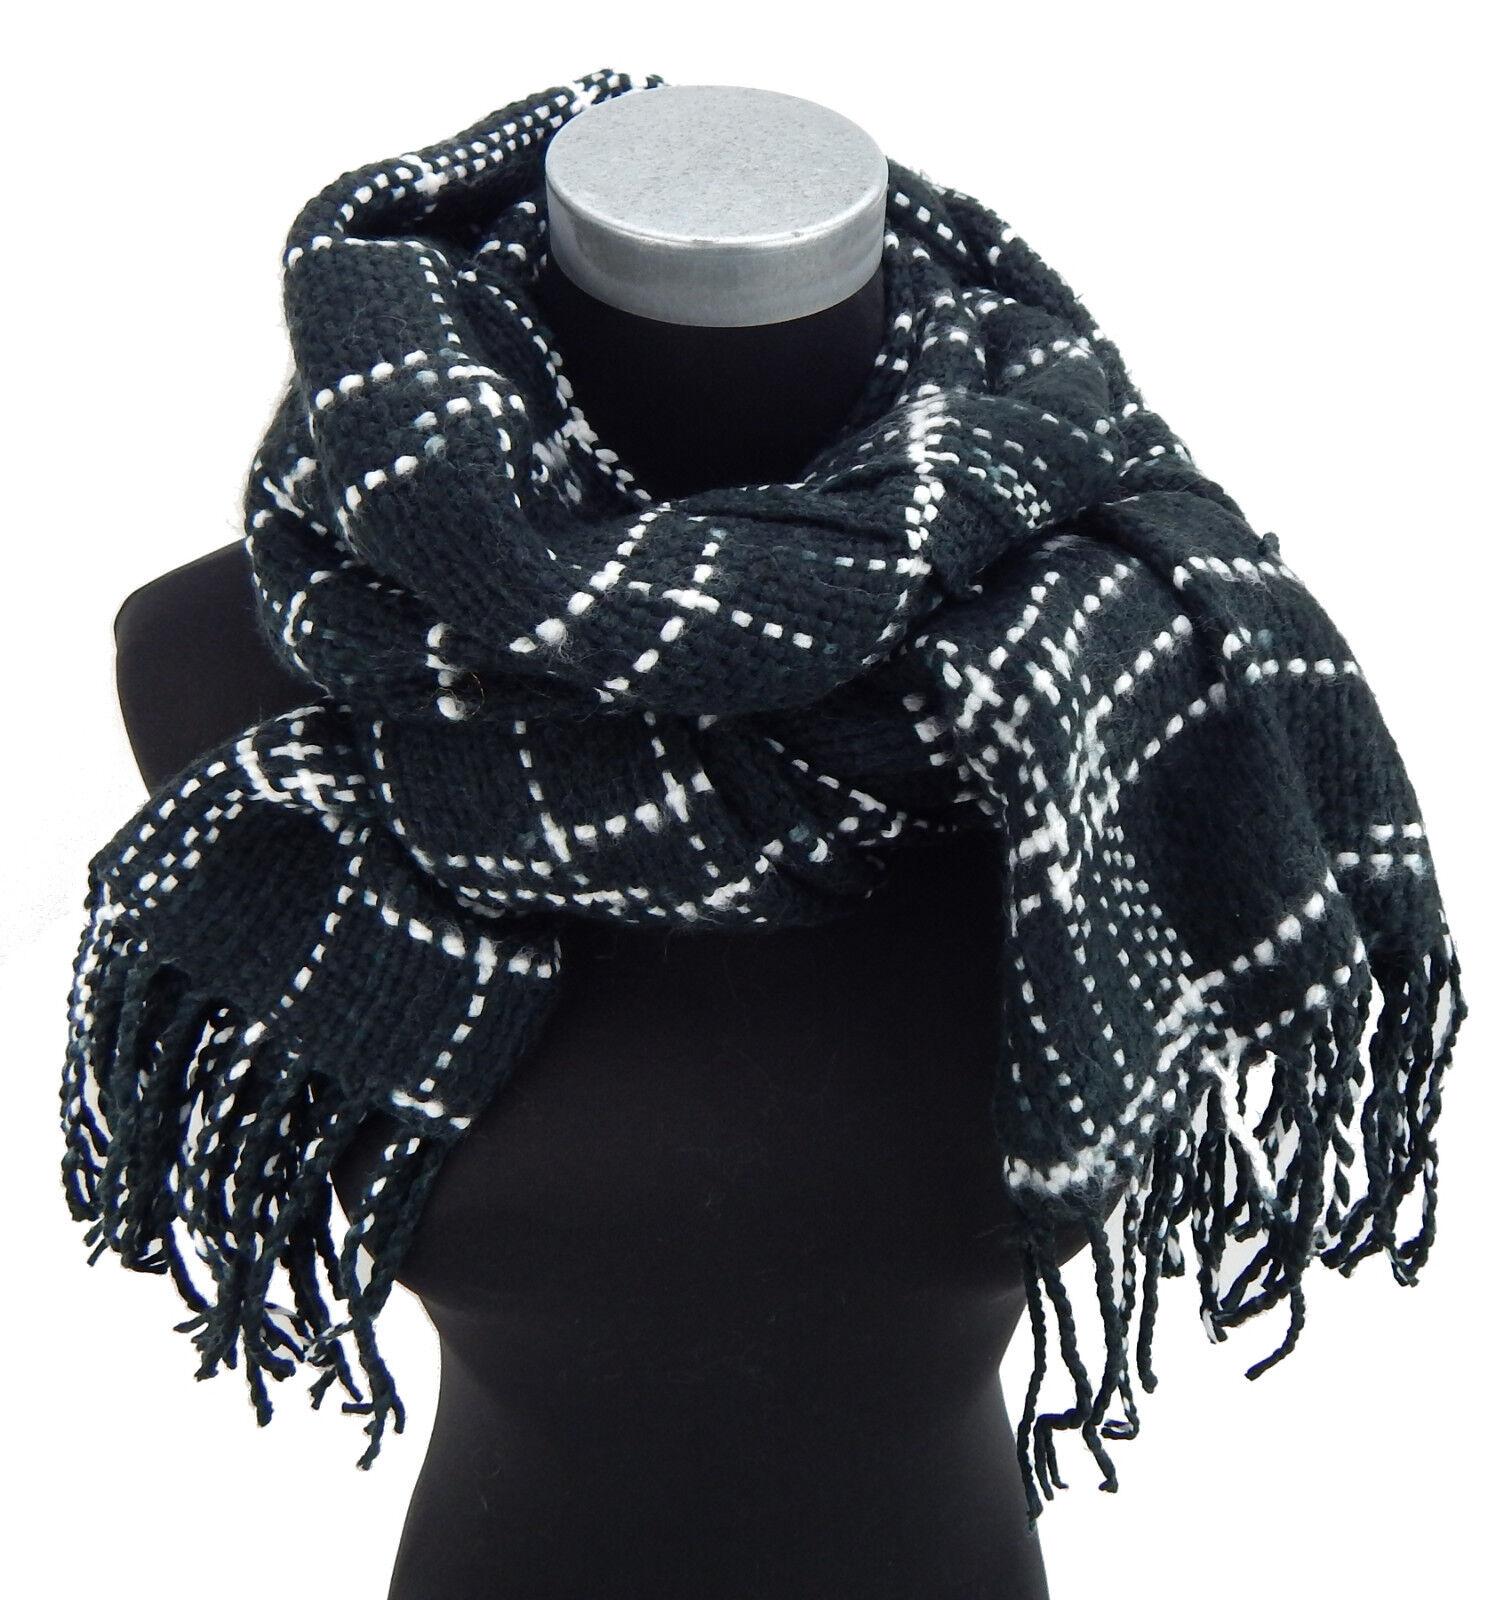 Damenschal altrosa blau grau weich warm Ella Jonte Schal Winter Wolle Kaschmir